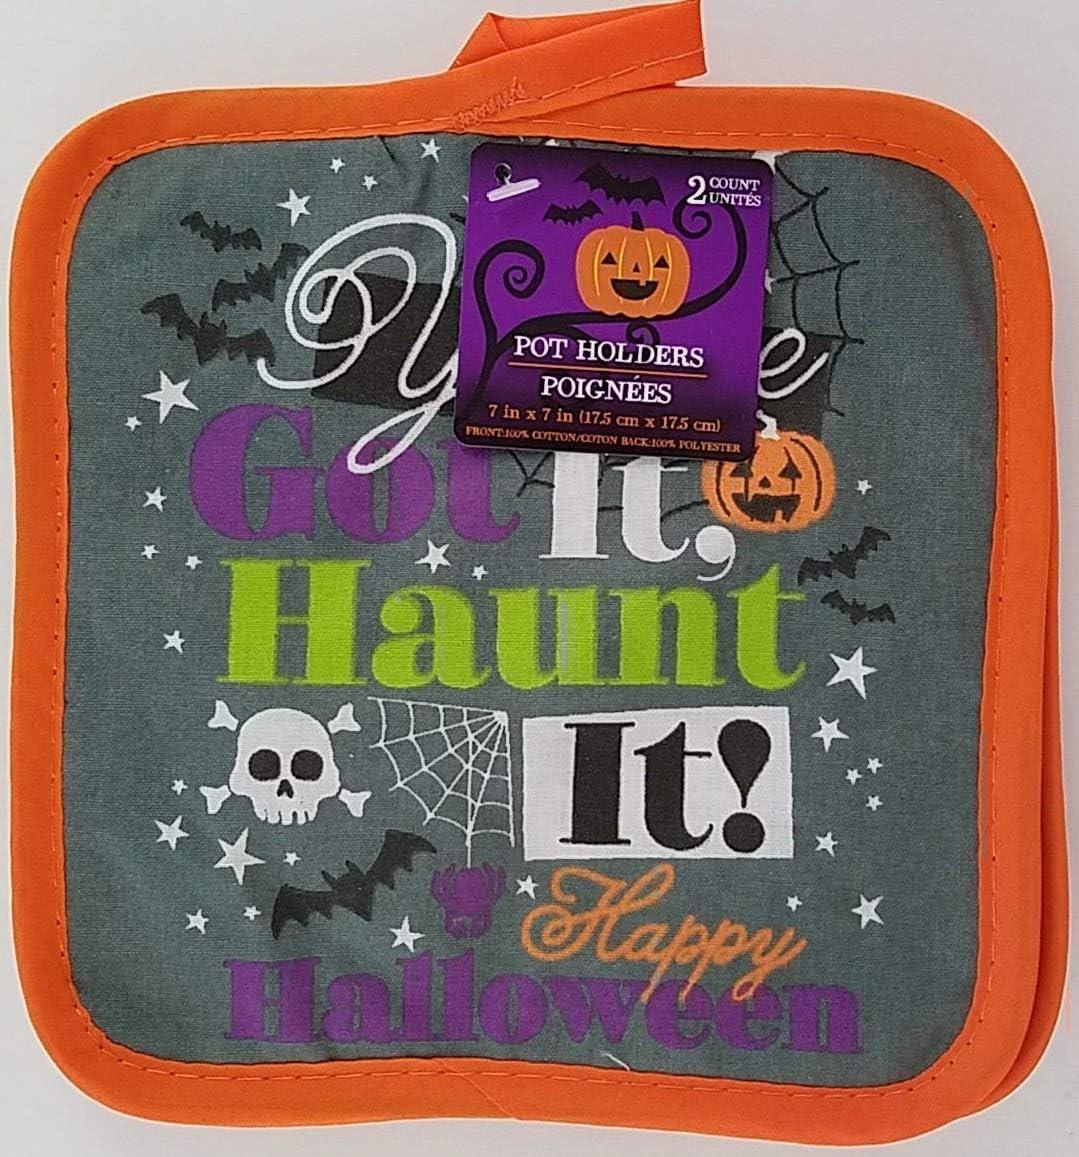 Halloween Kitchen Linen Towels, Oven Mitts & Pot Holders, Select Theme (Haunt It Pot Holder)